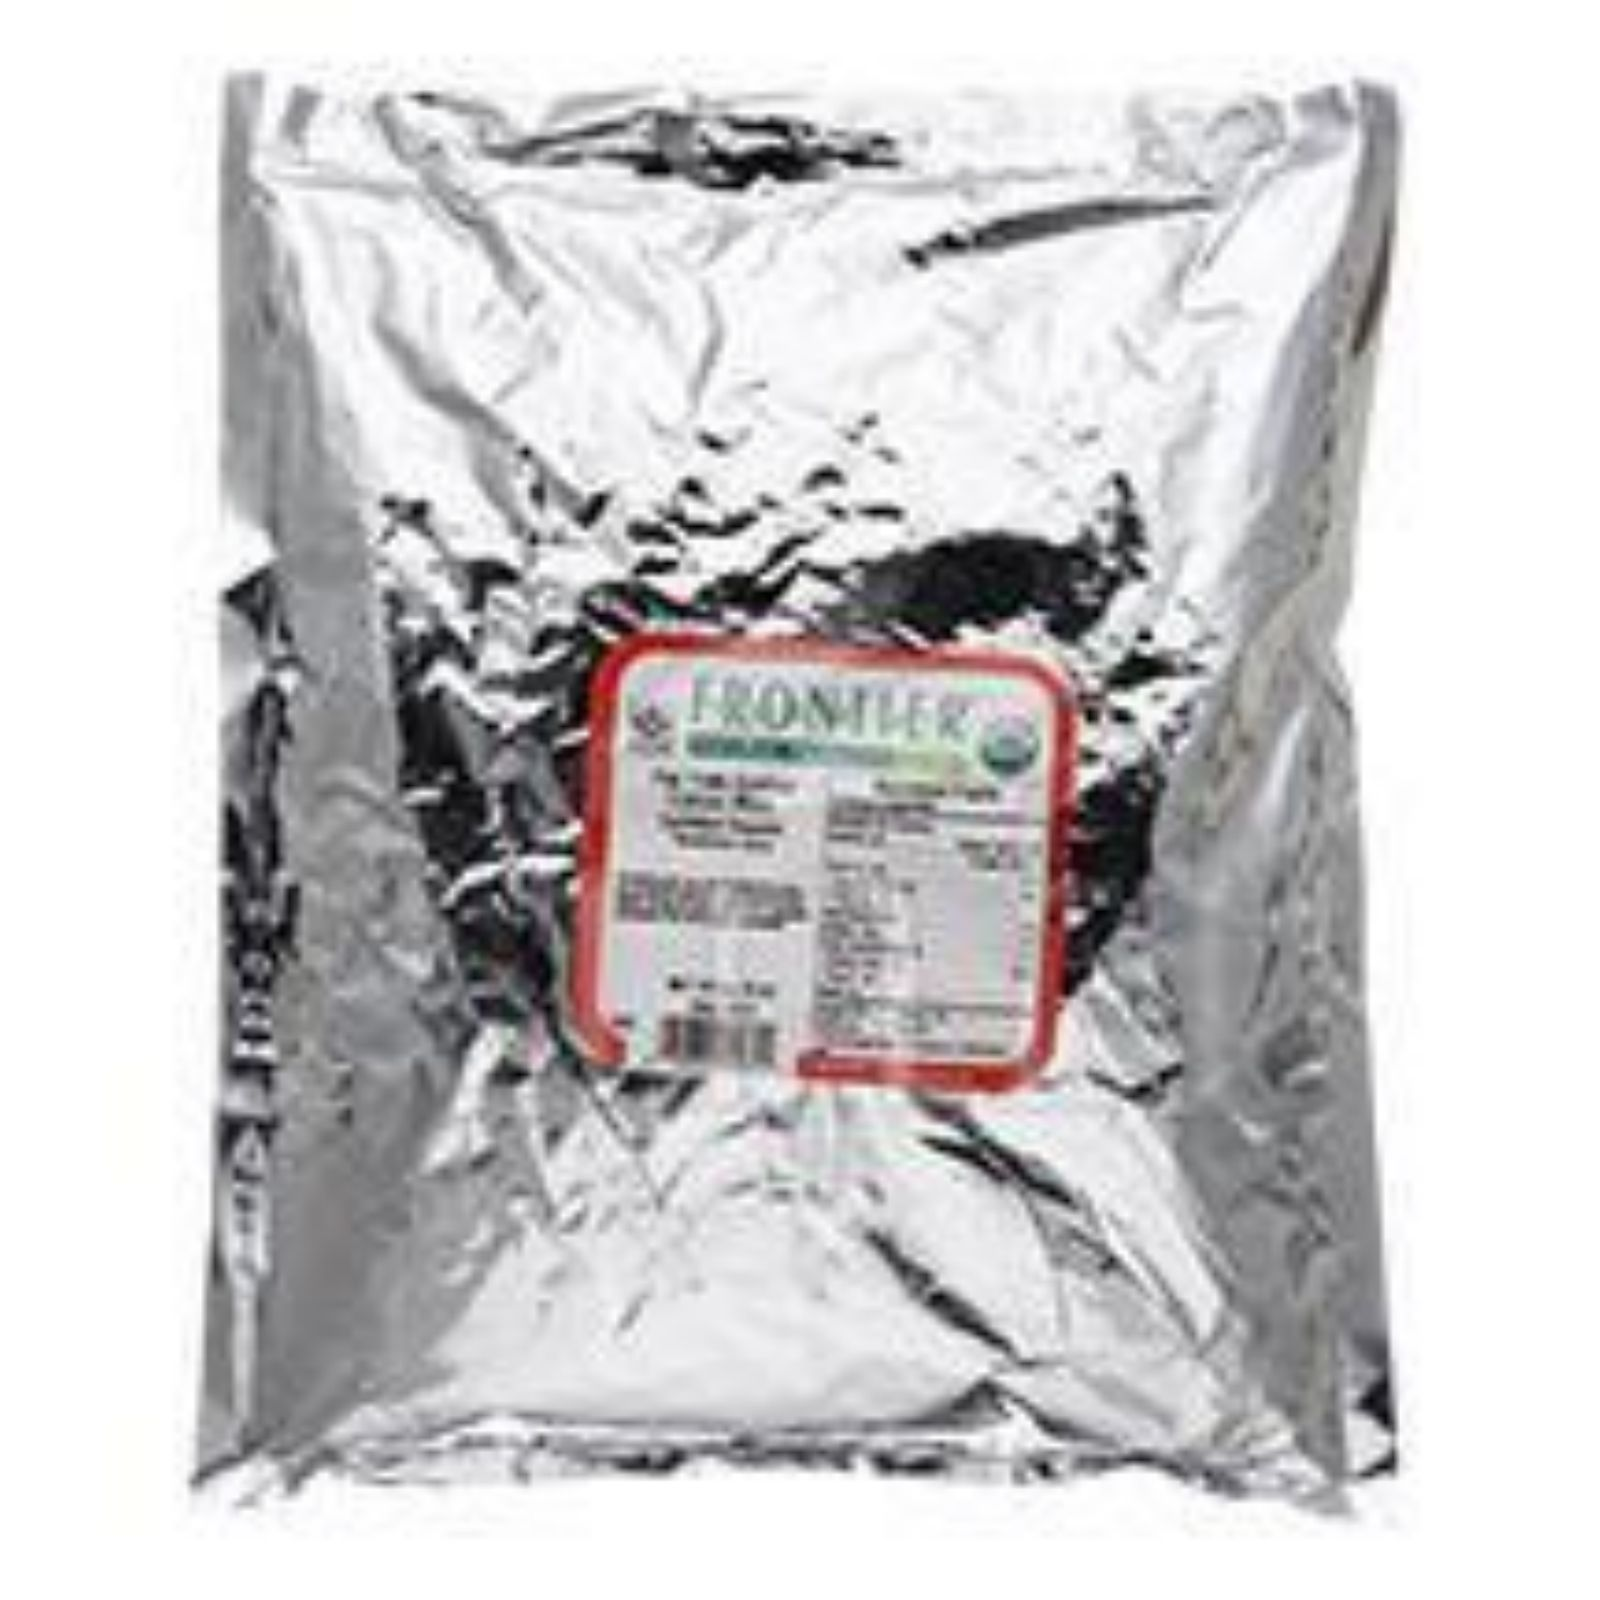 Frontier Herb Cacao Nibs - Organic - Fair Trade Certified - Bulk - 1 Lb